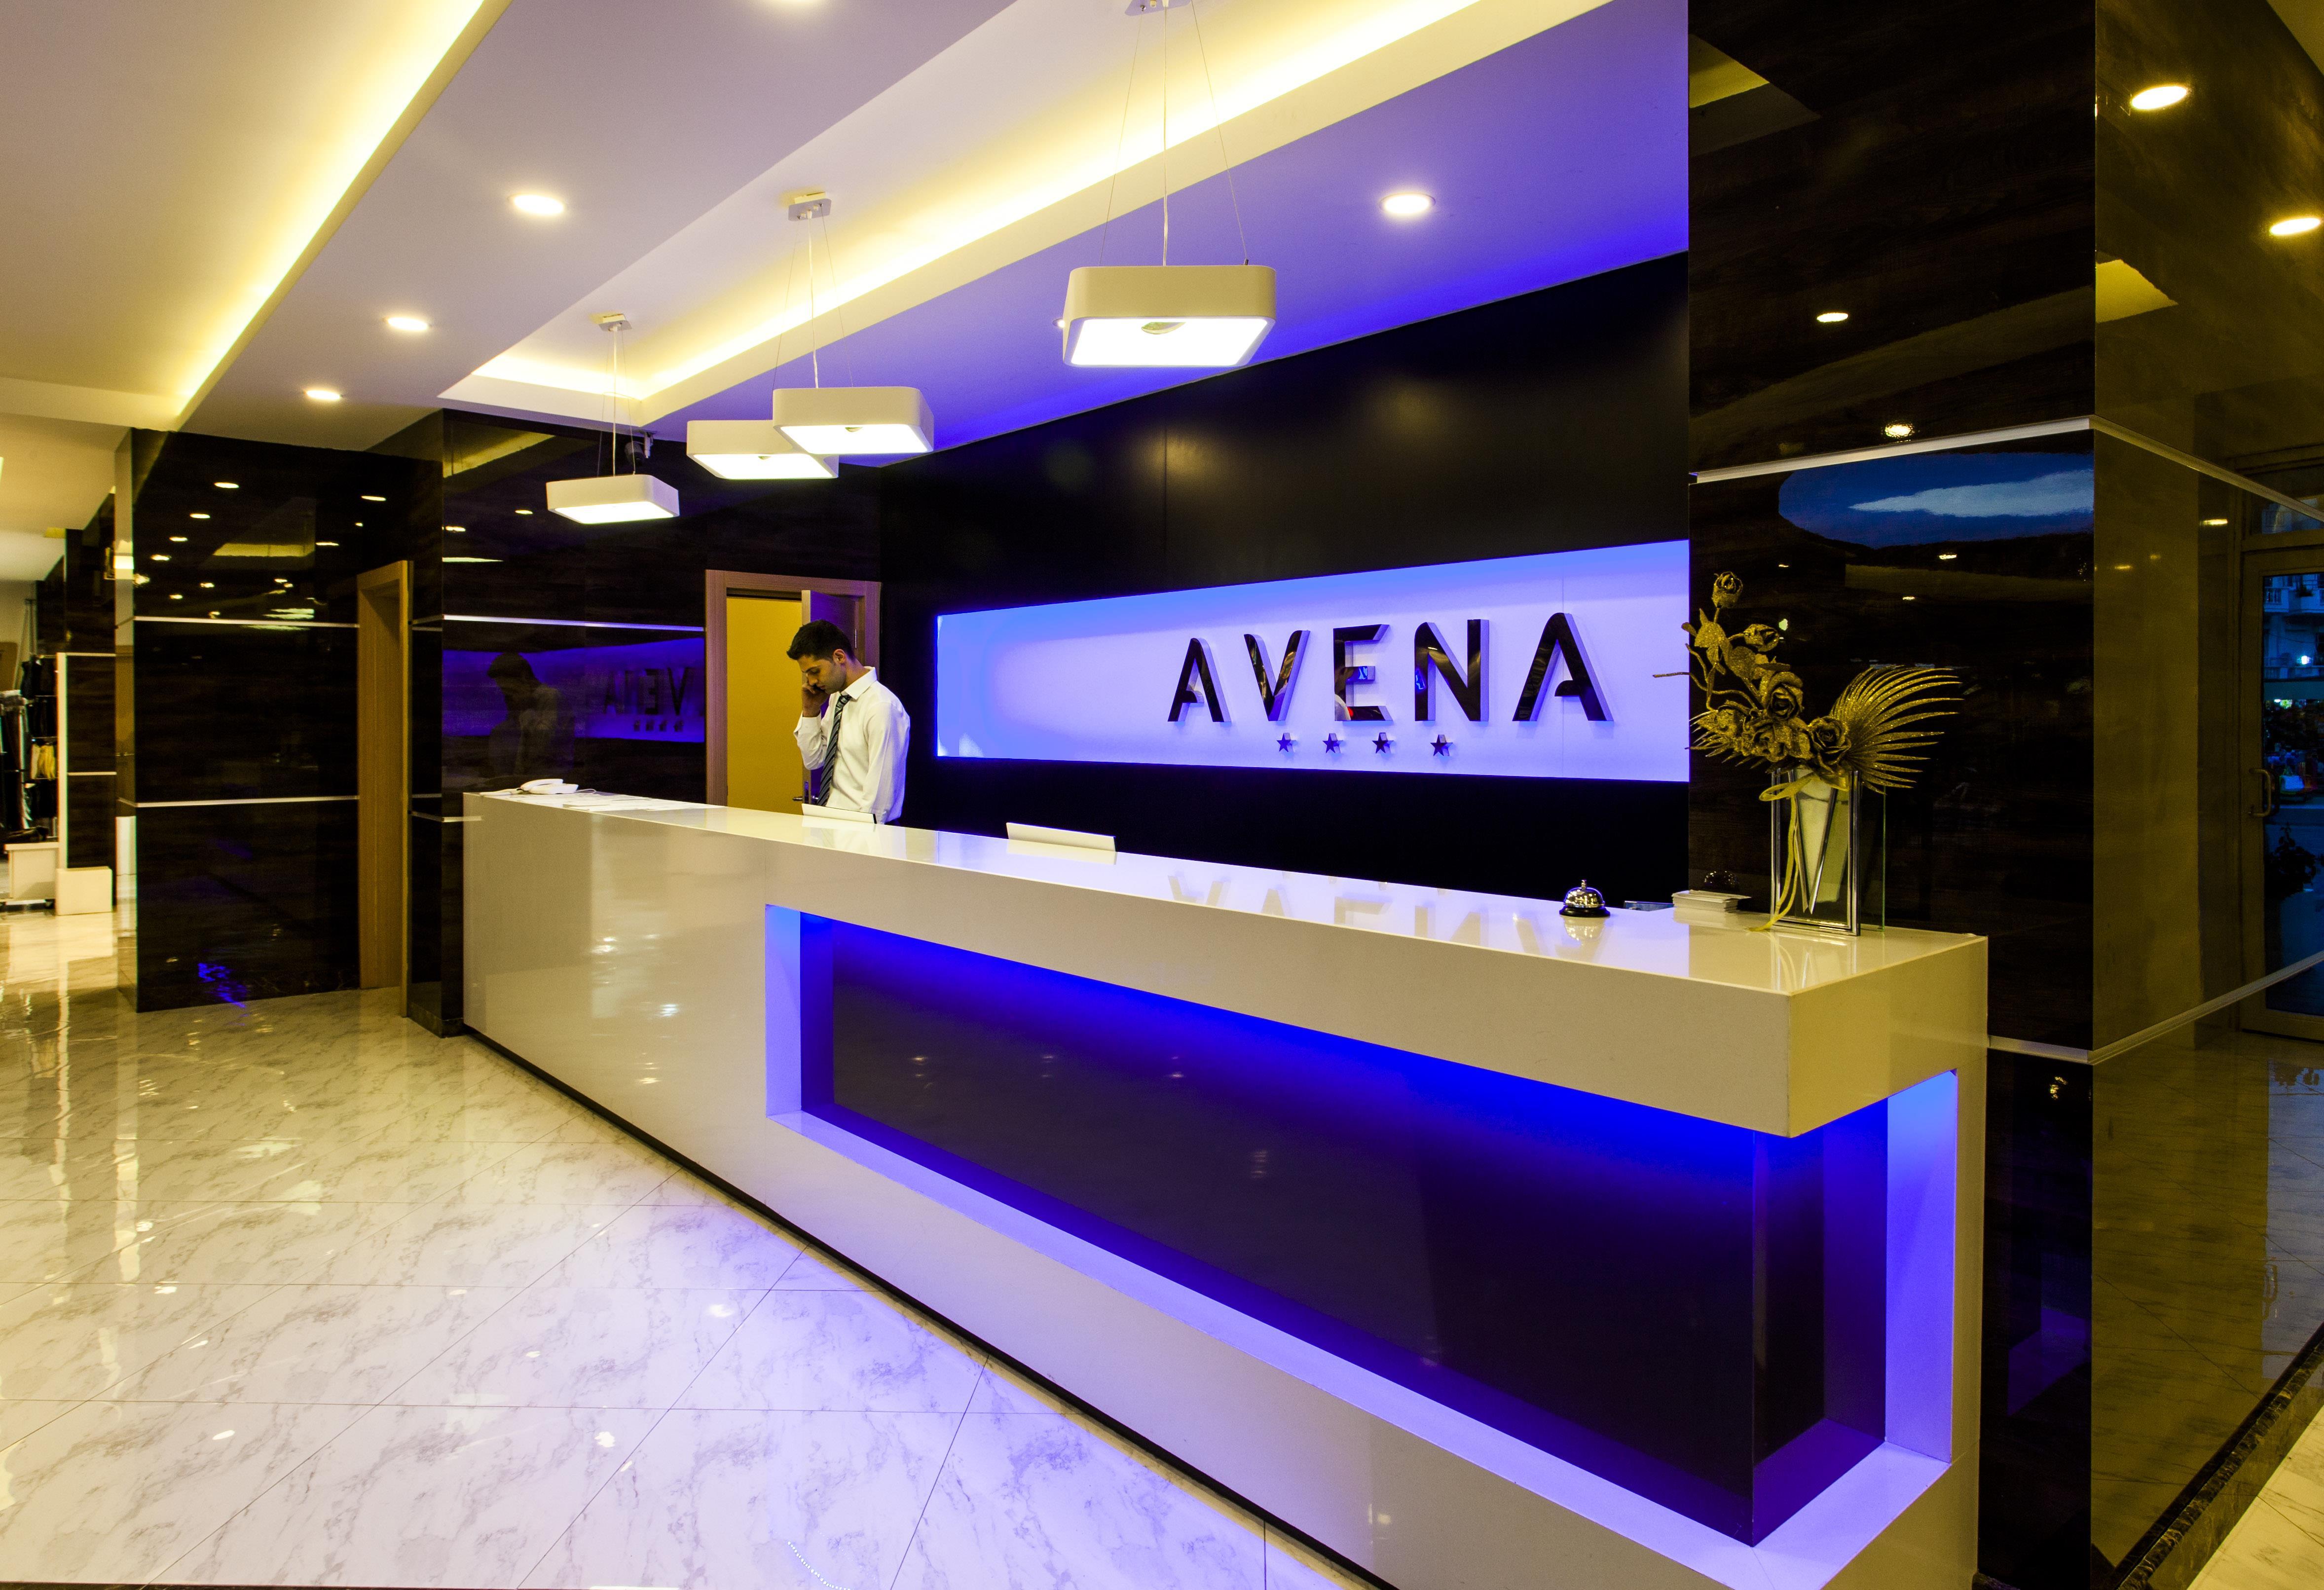 avena-resort-spa-hotel-ex-gold-safran-hotel-genel-004